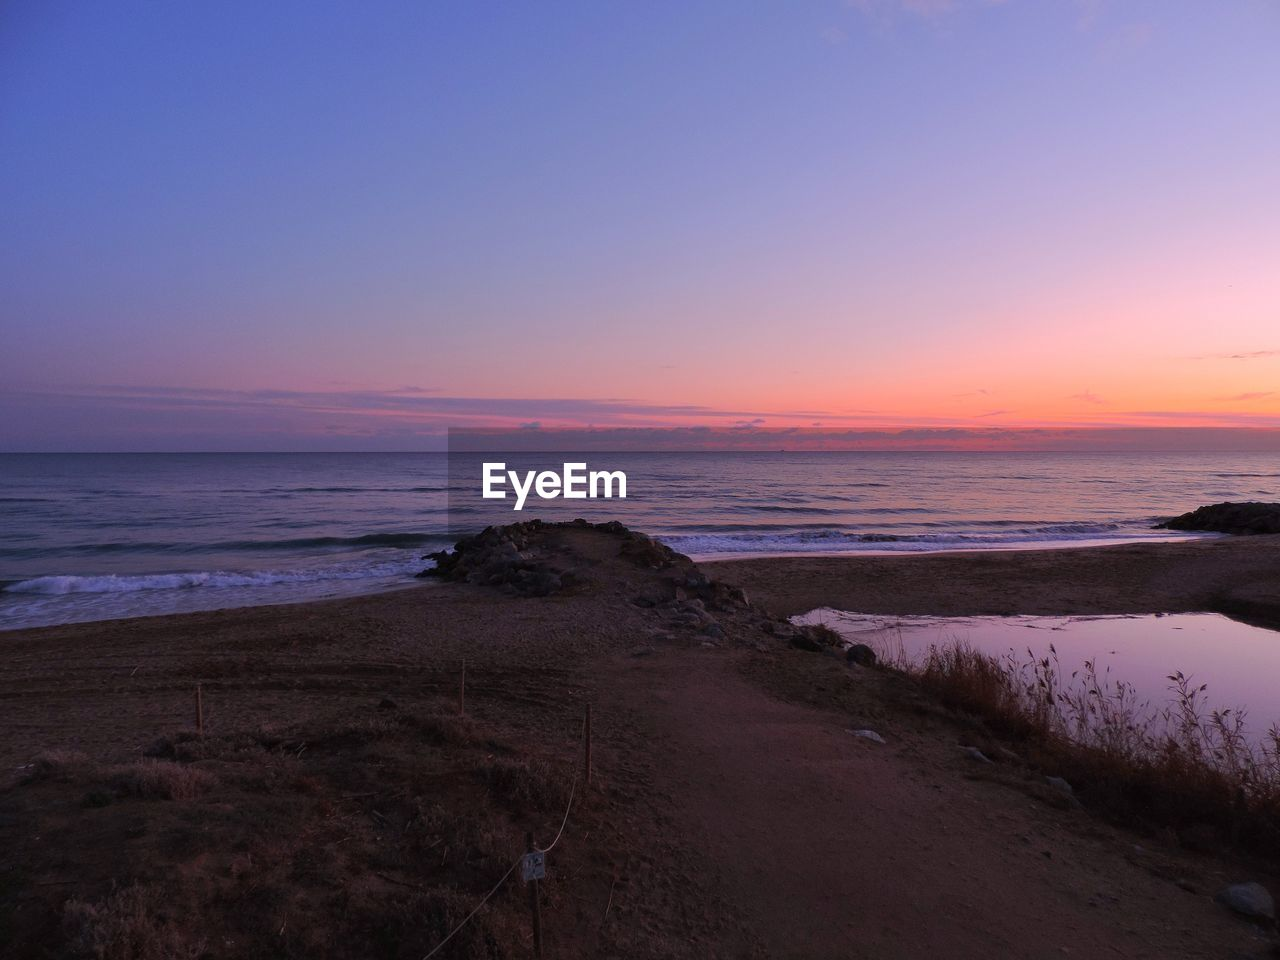 sky, sunset, scenics - nature, water, sea, beauty in nature, beach, tranquility, tranquil scene, horizon over water, horizon, land, orange color, idyllic, no people, nature, non-urban scene, cloud - sky, outdoors